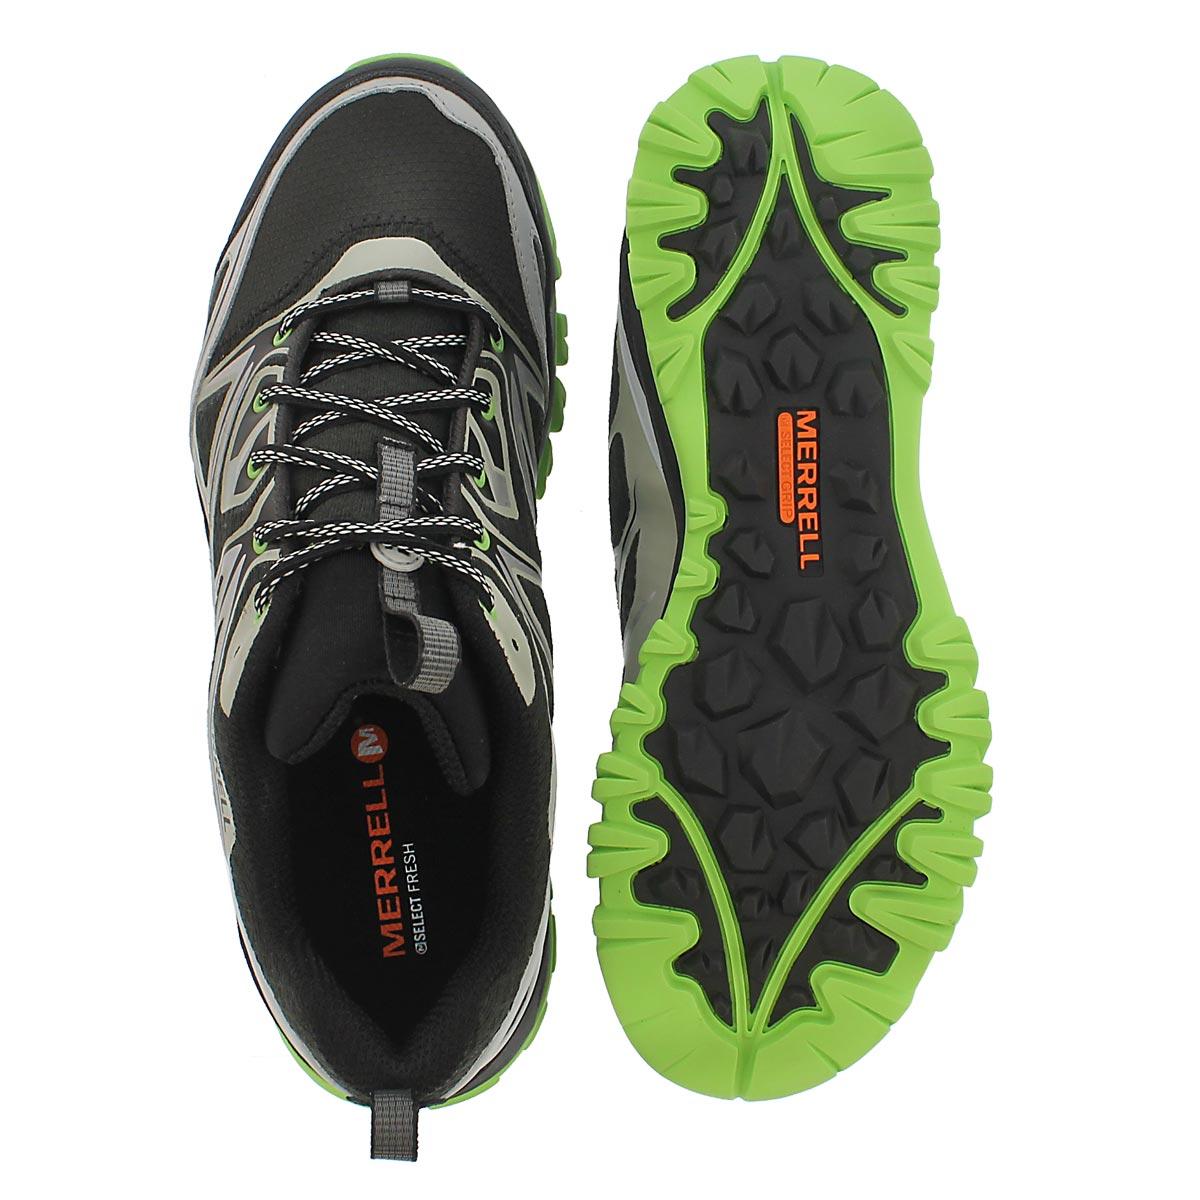 Mns Capra Bolt black/silver hiking shoe